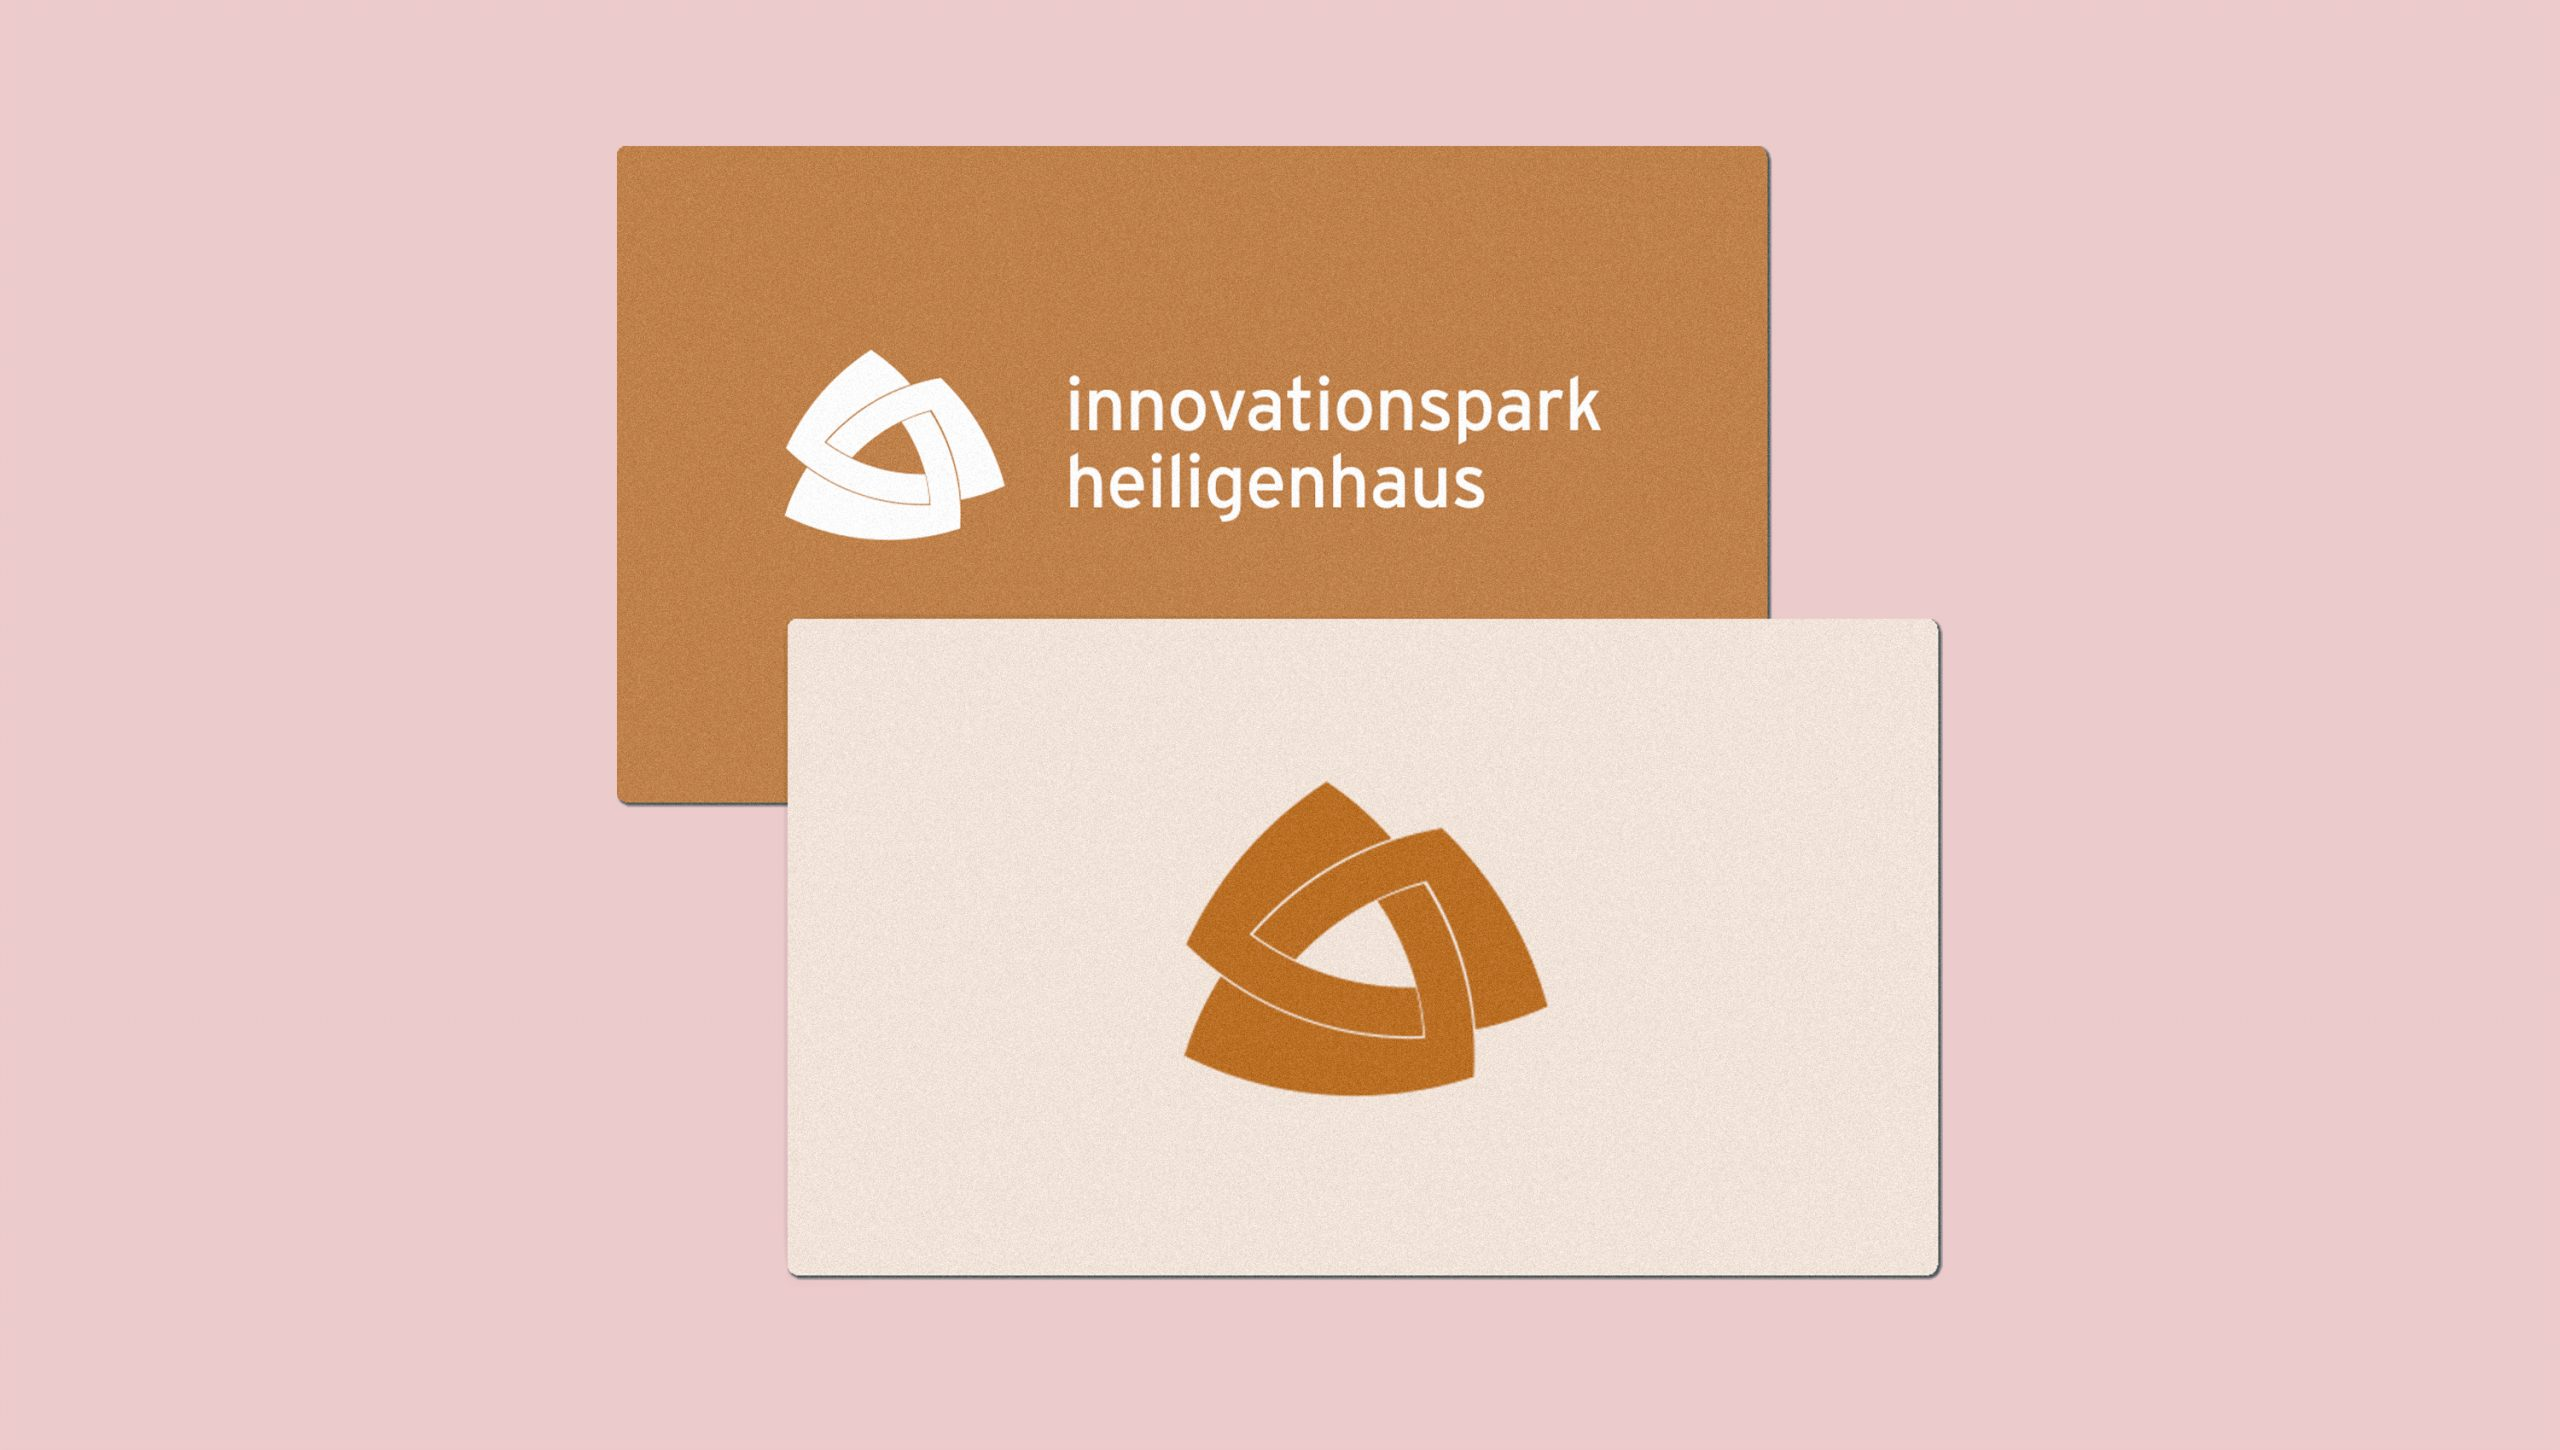 artee_corporate_cards_innovationspark_heiligenhaus